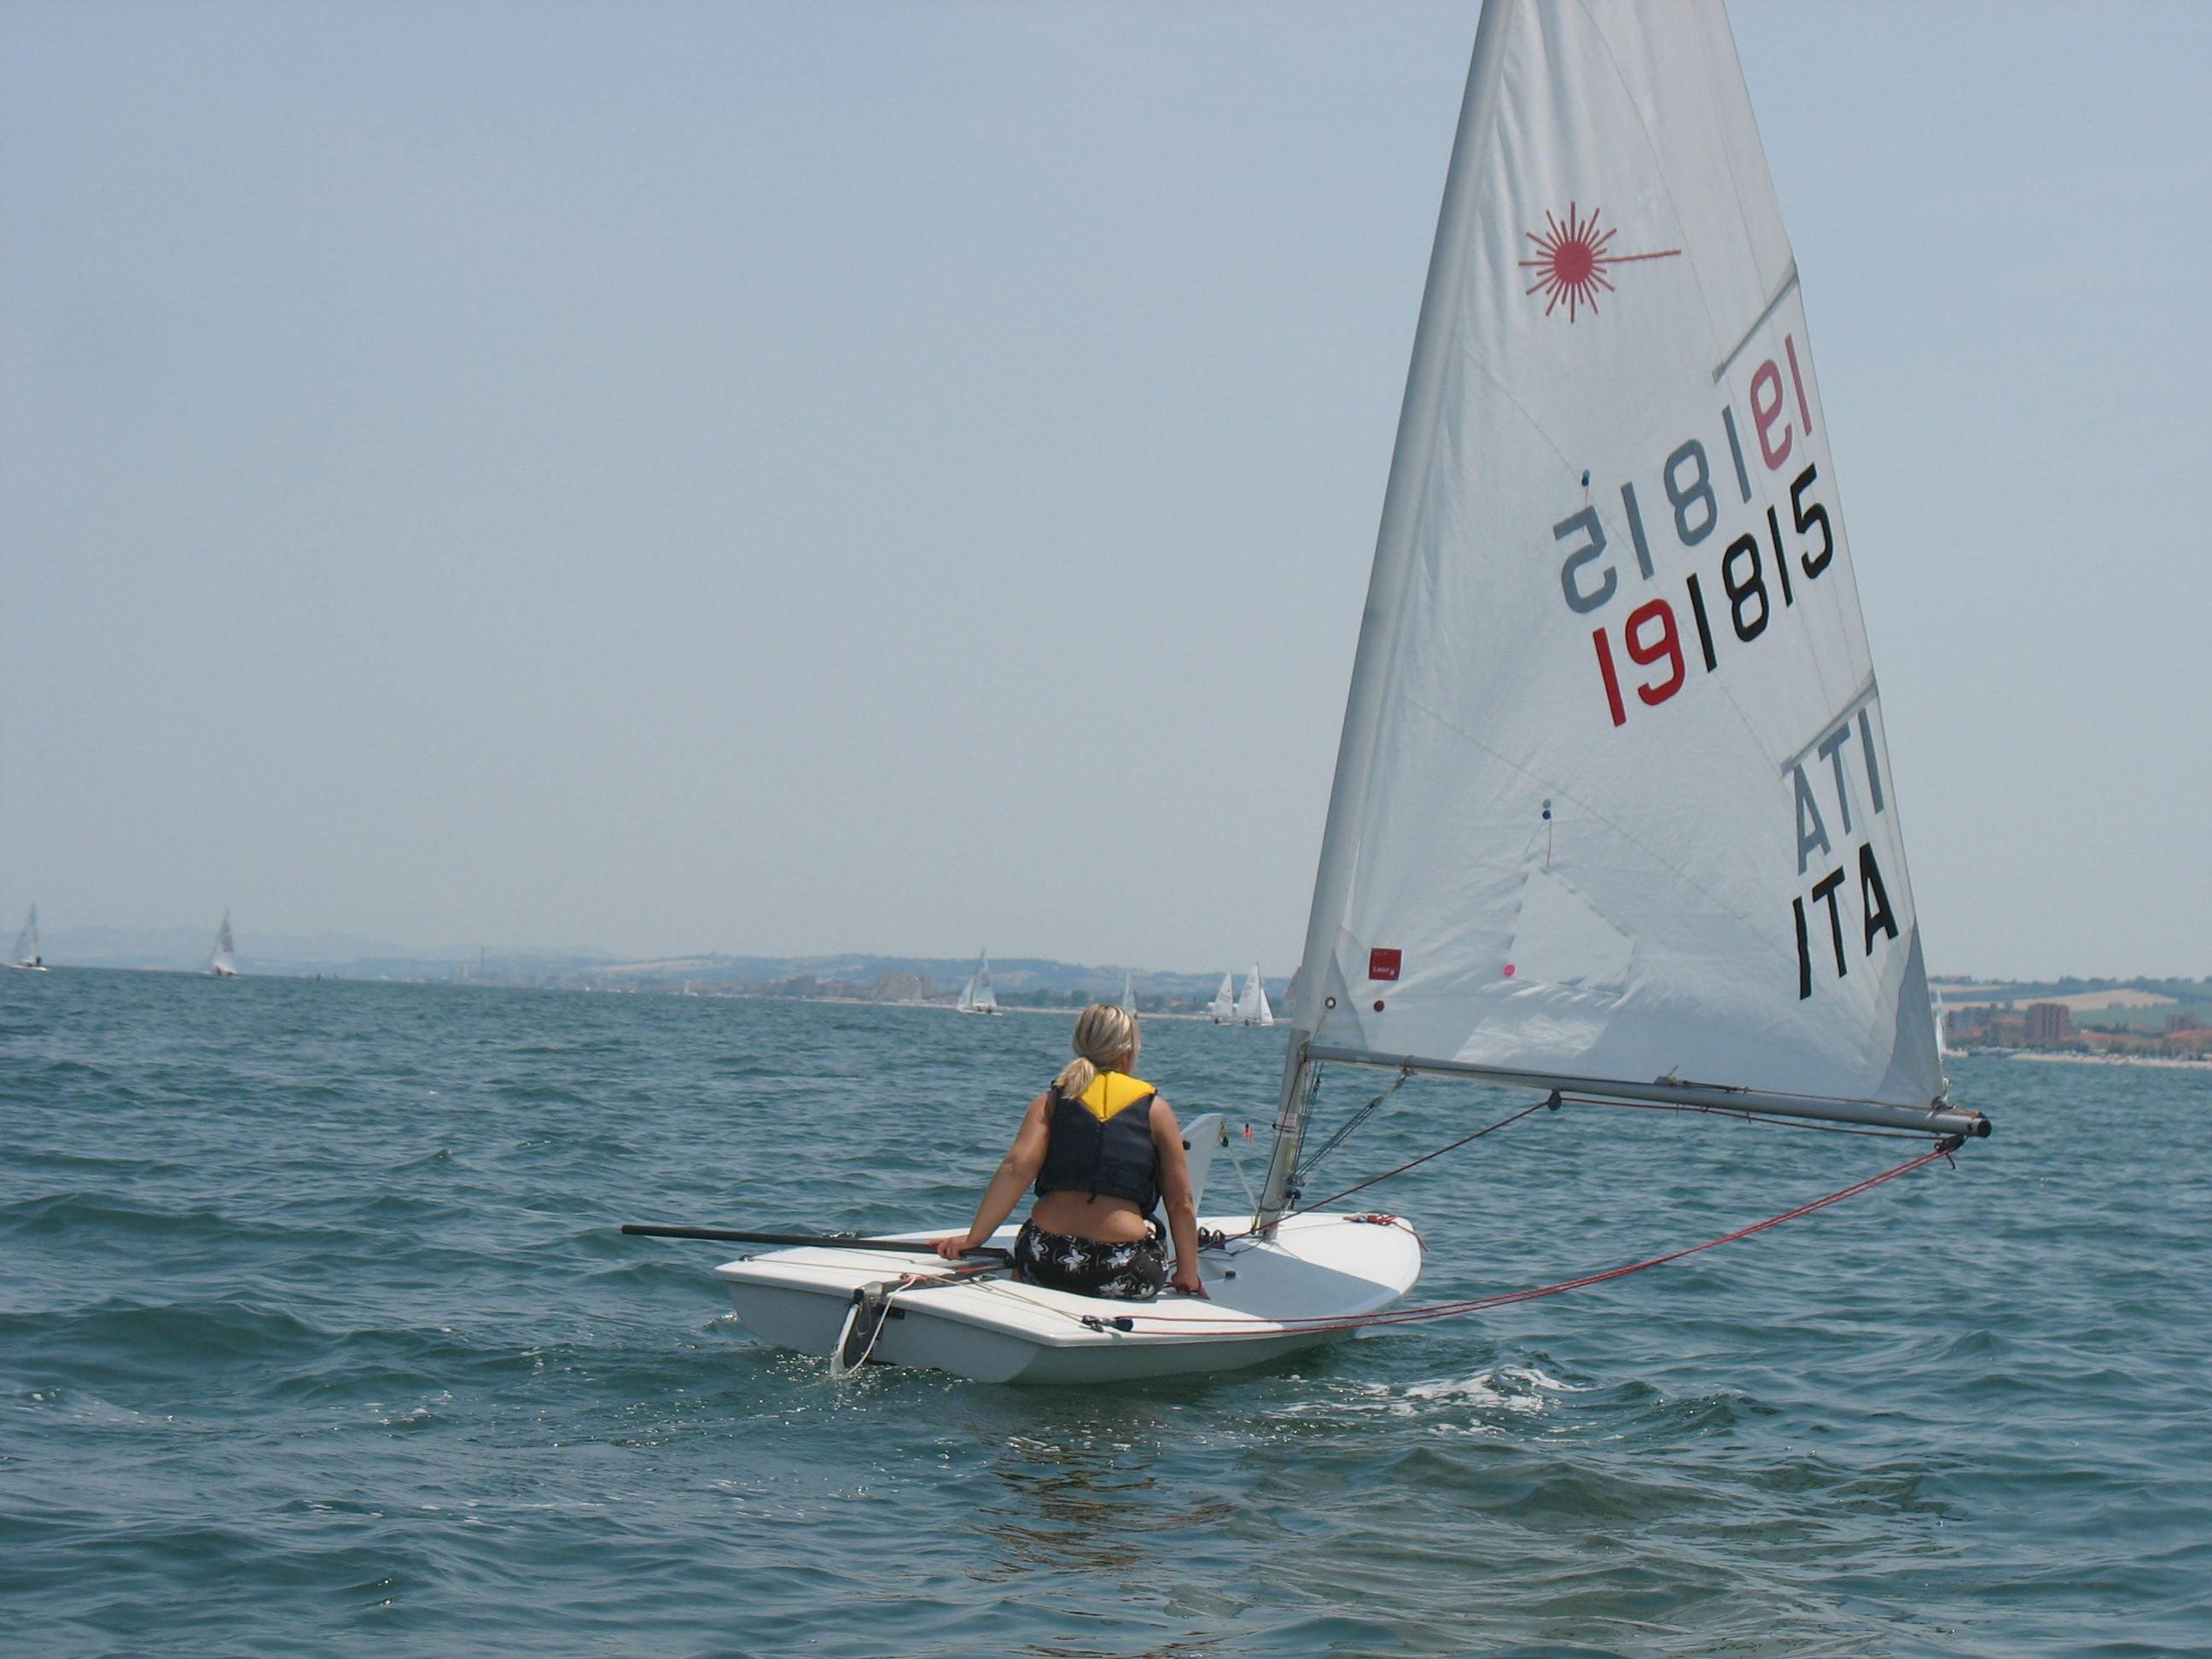 5-torneo-elia-tonelli-27062010-062